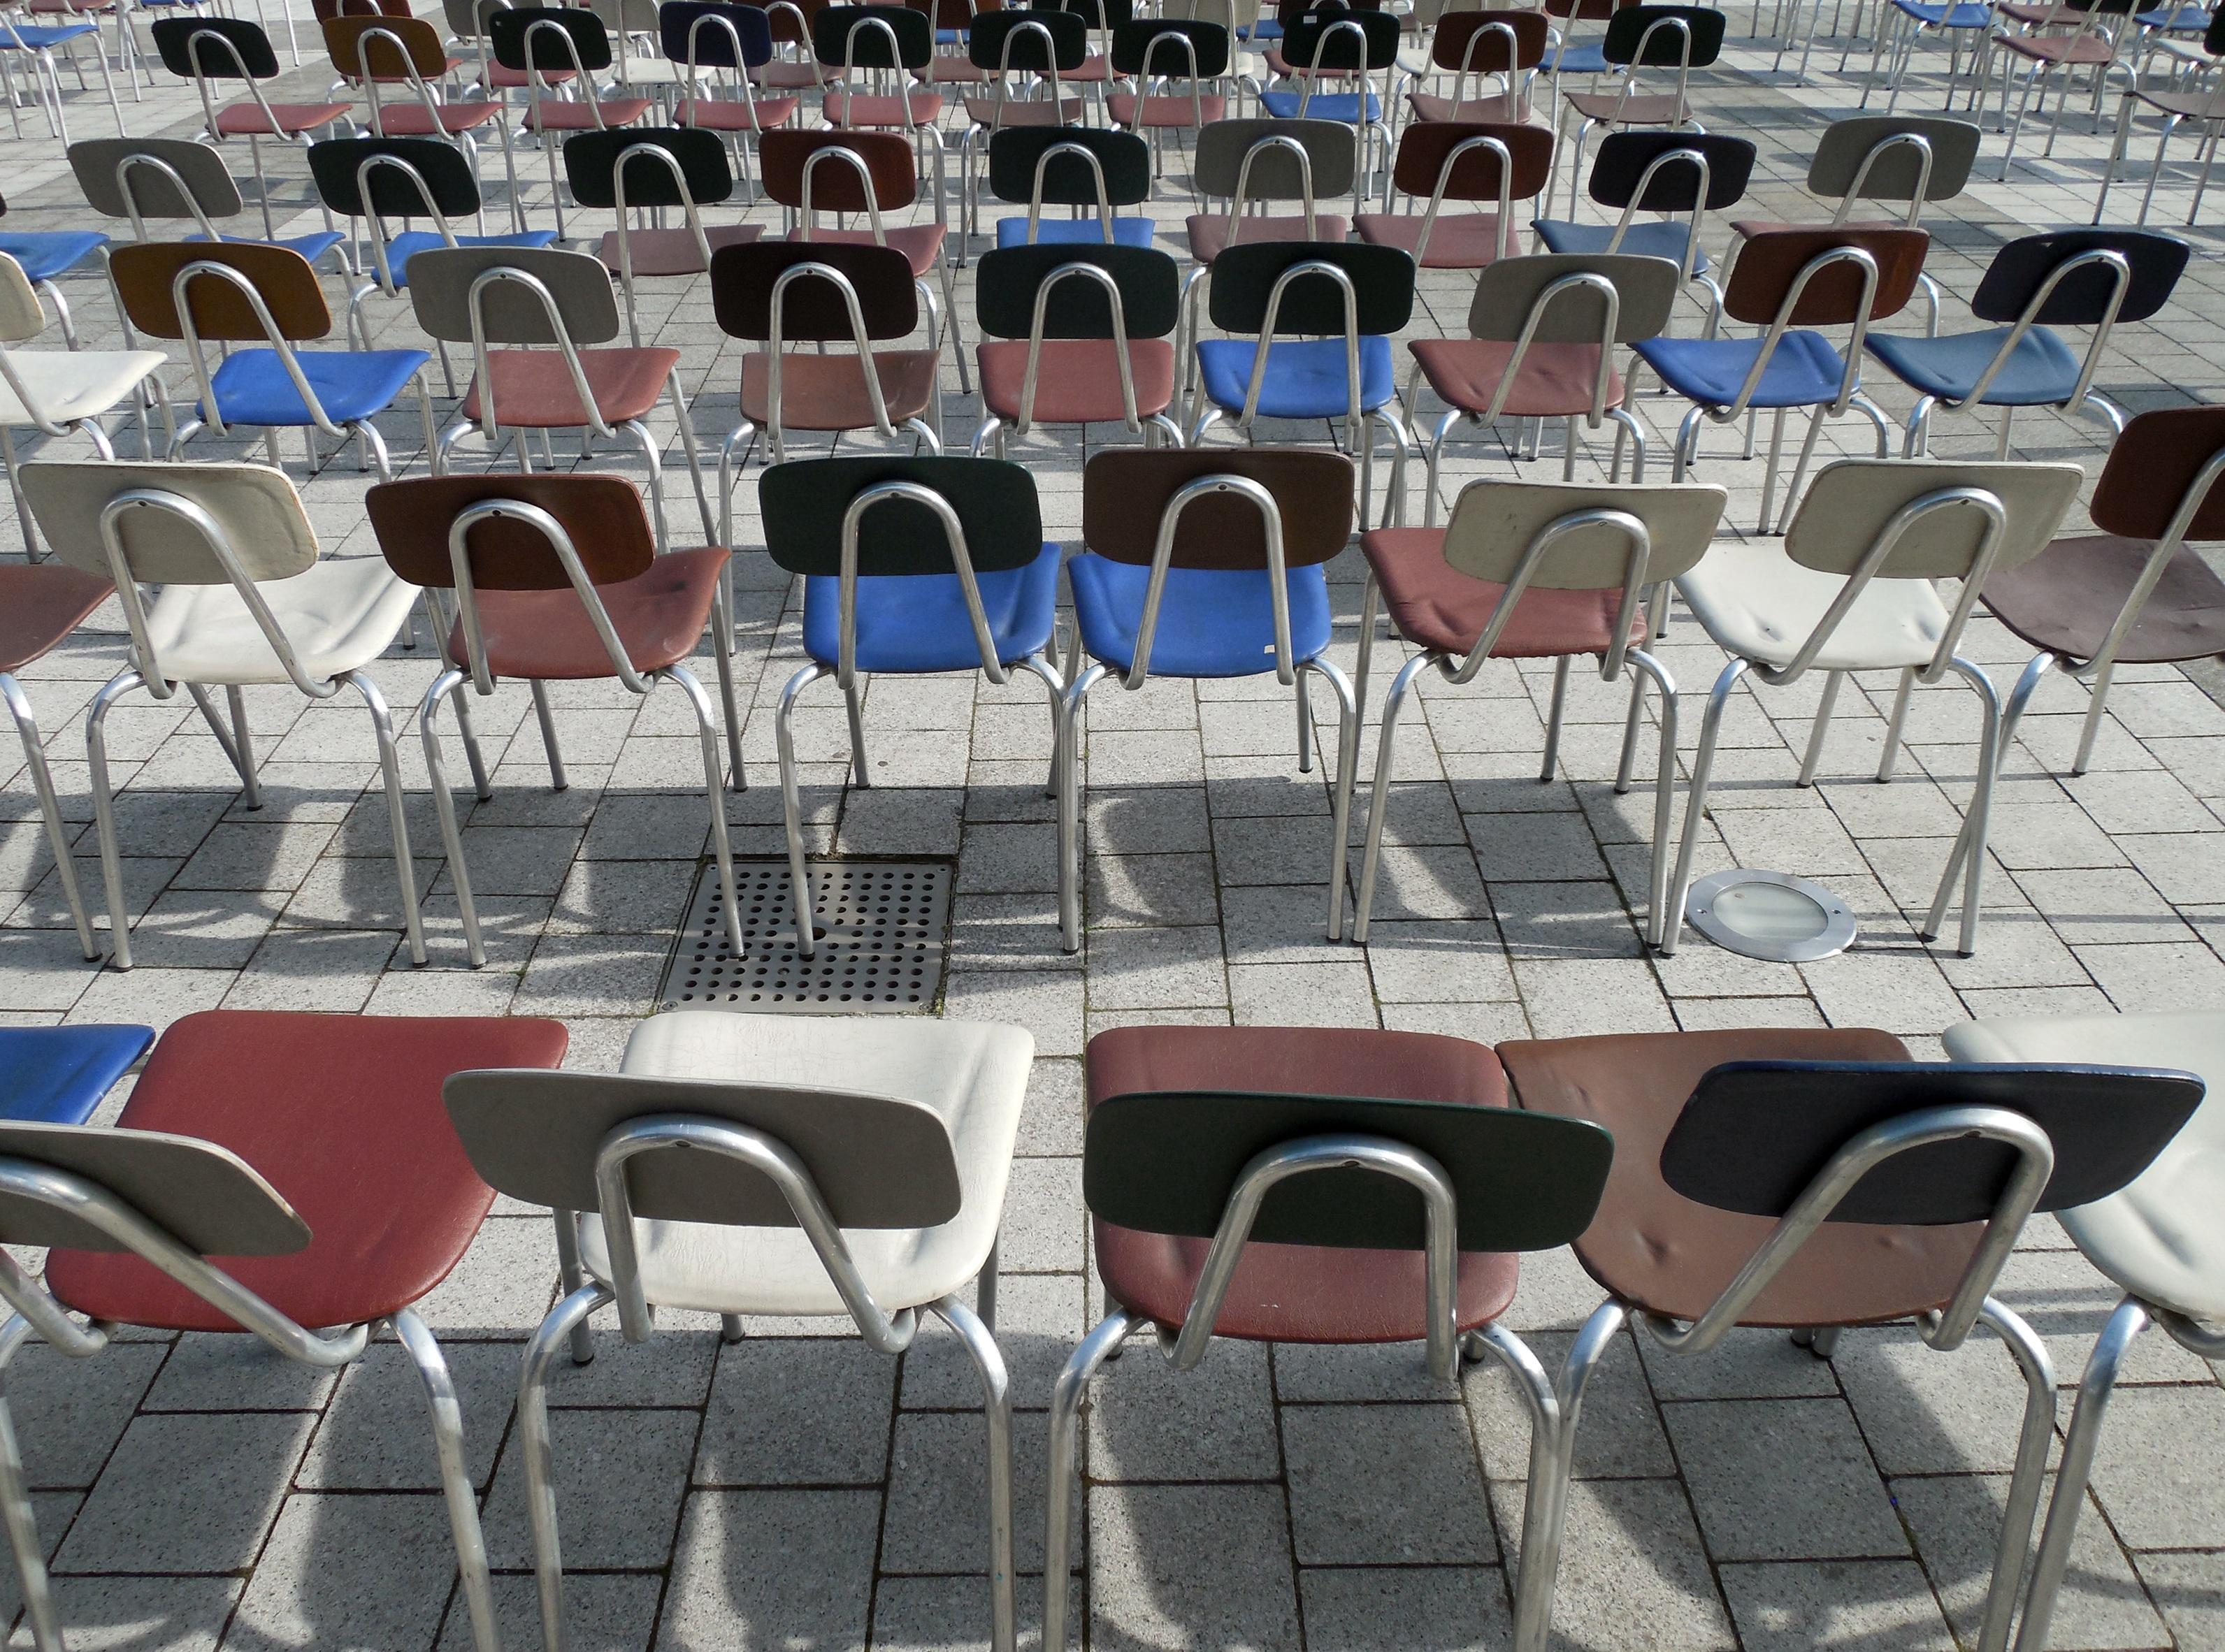 Möbel Leer kostenlose foto struktur auditorium sitz publikum leer möbel